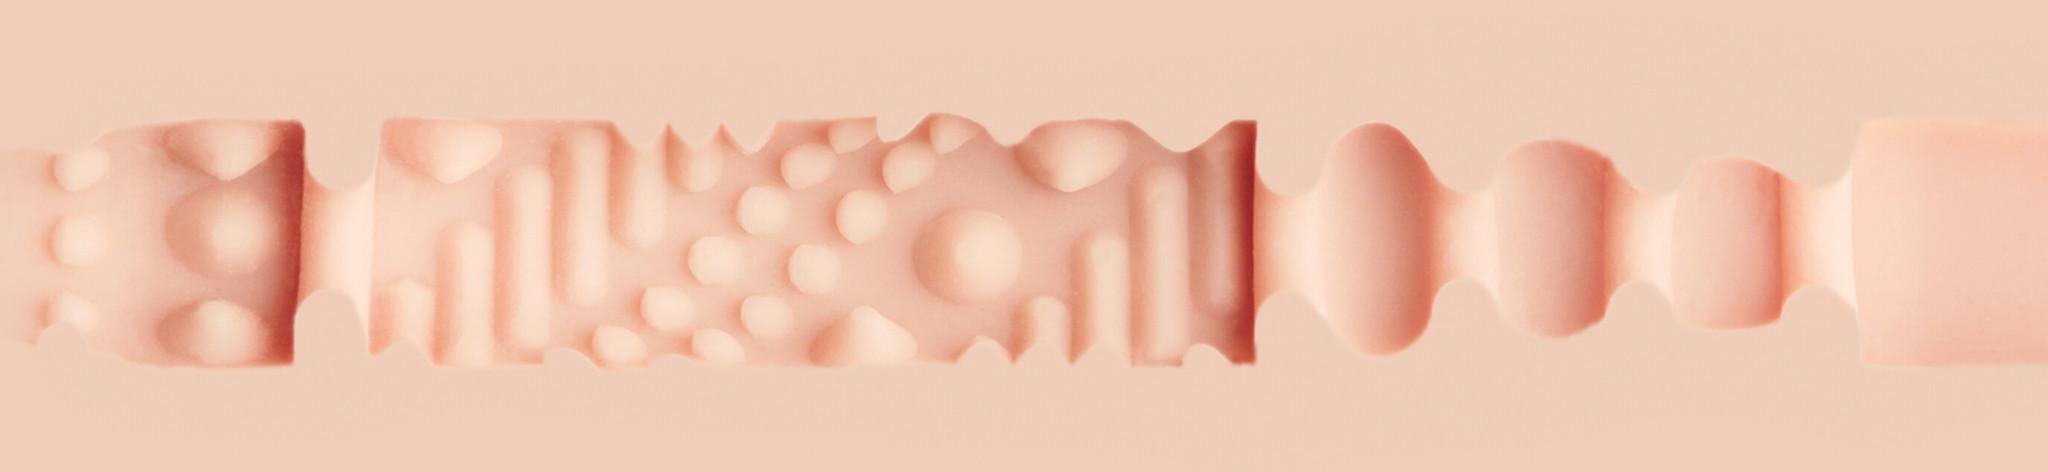 ChristyMack-Attack-Texture.jpg